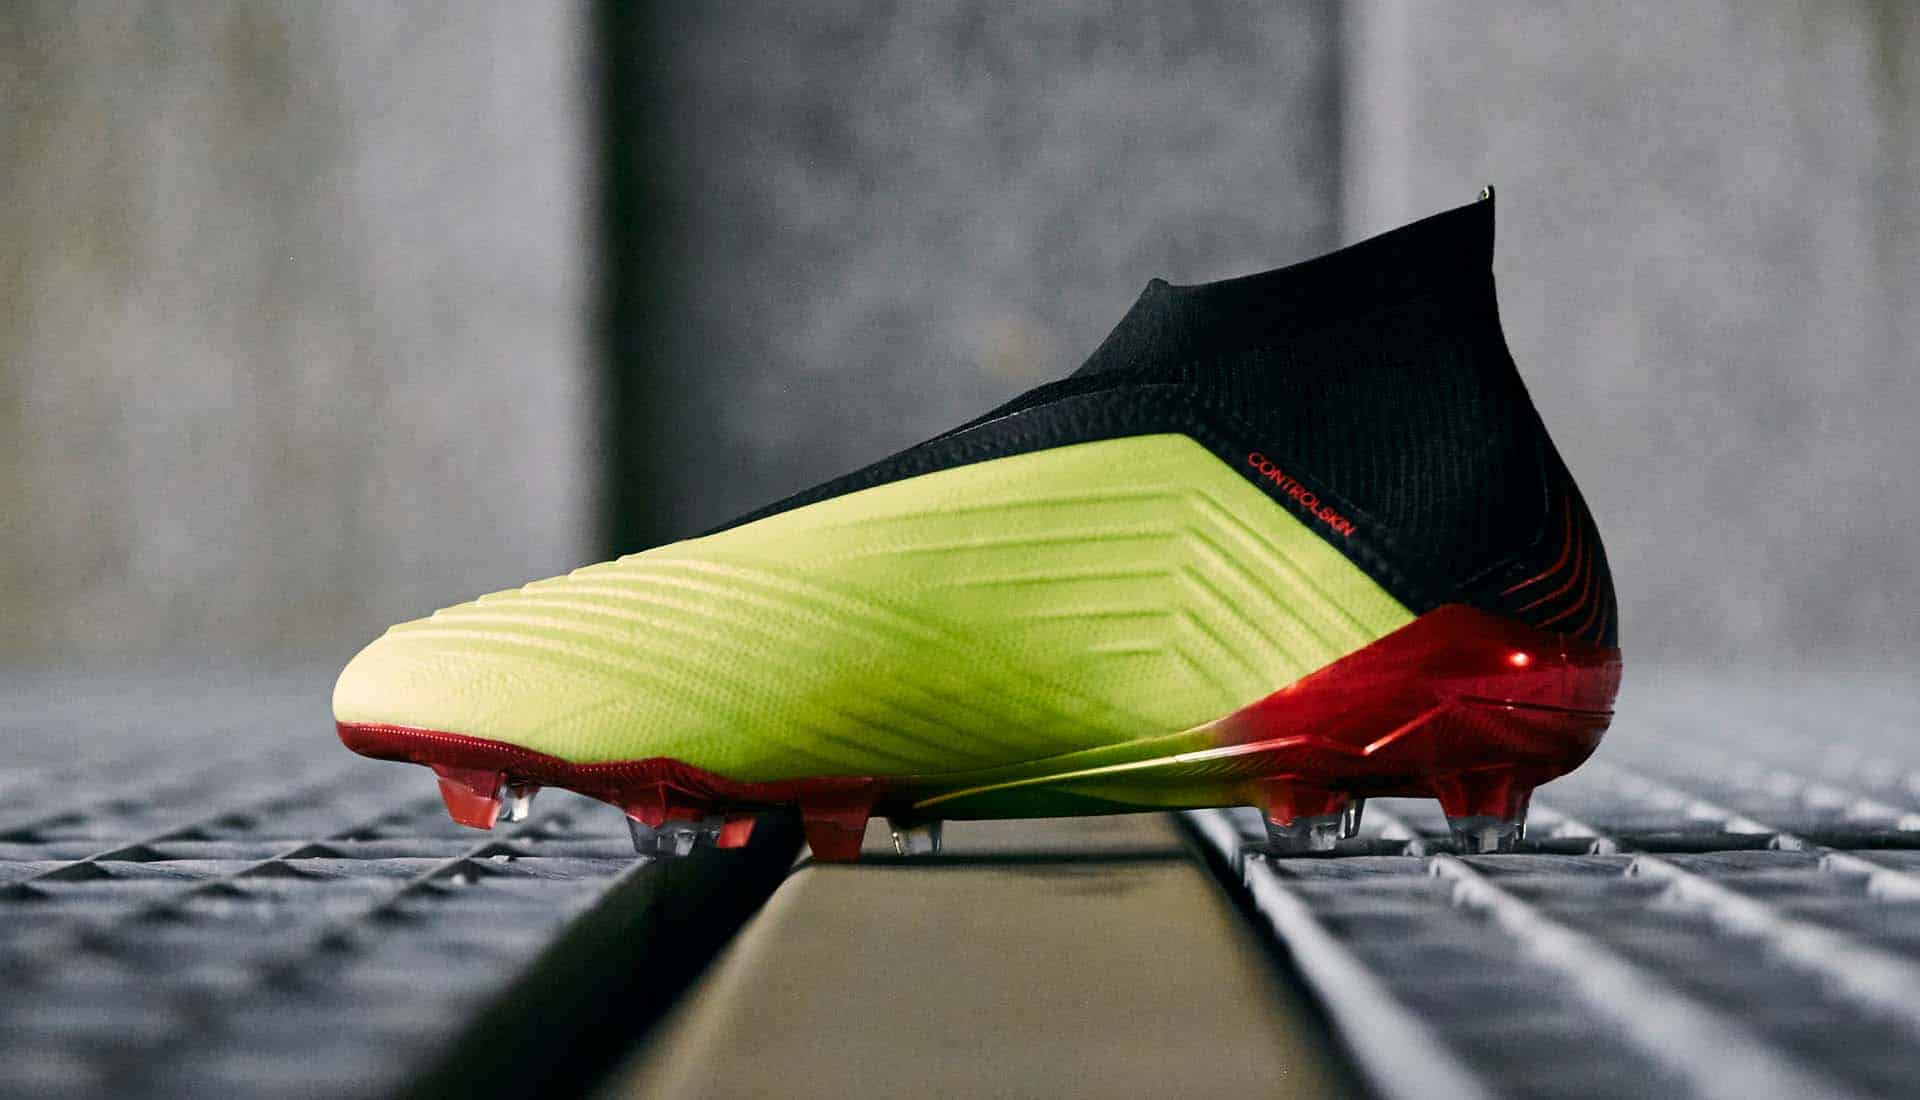 chaussures-adidas-Predator-18-energy-mode-img3